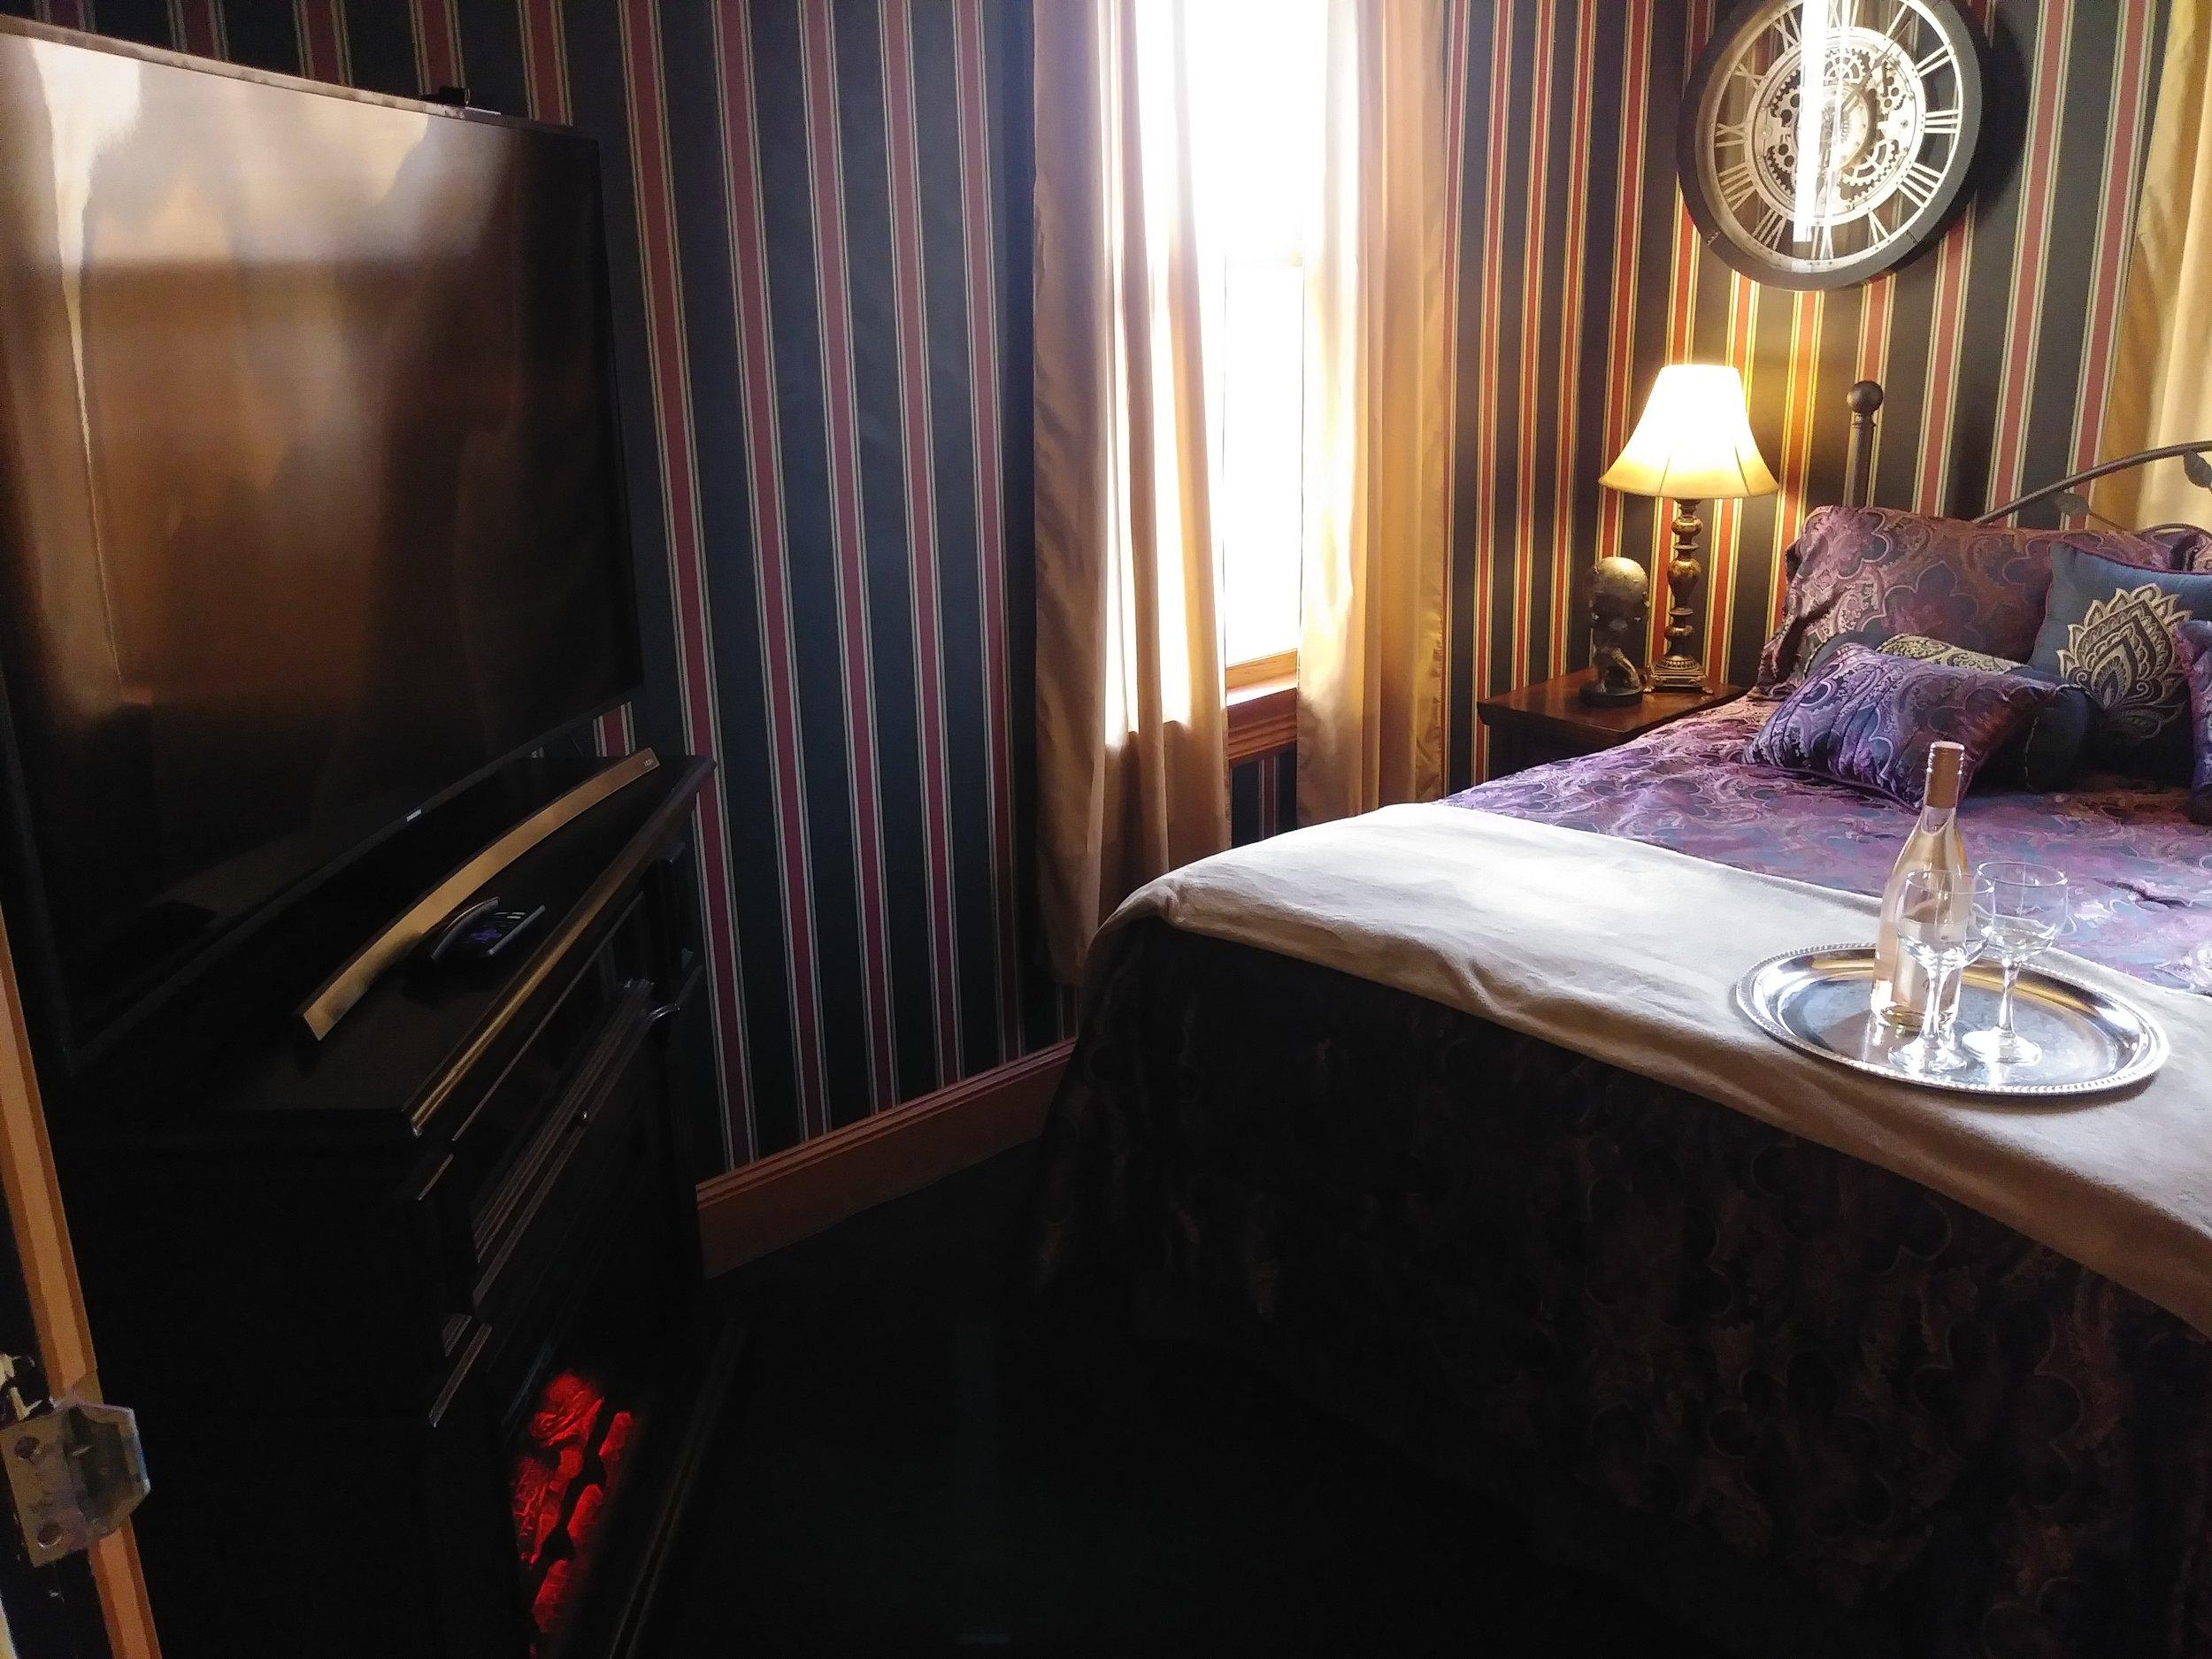 Room 207 06.jpg